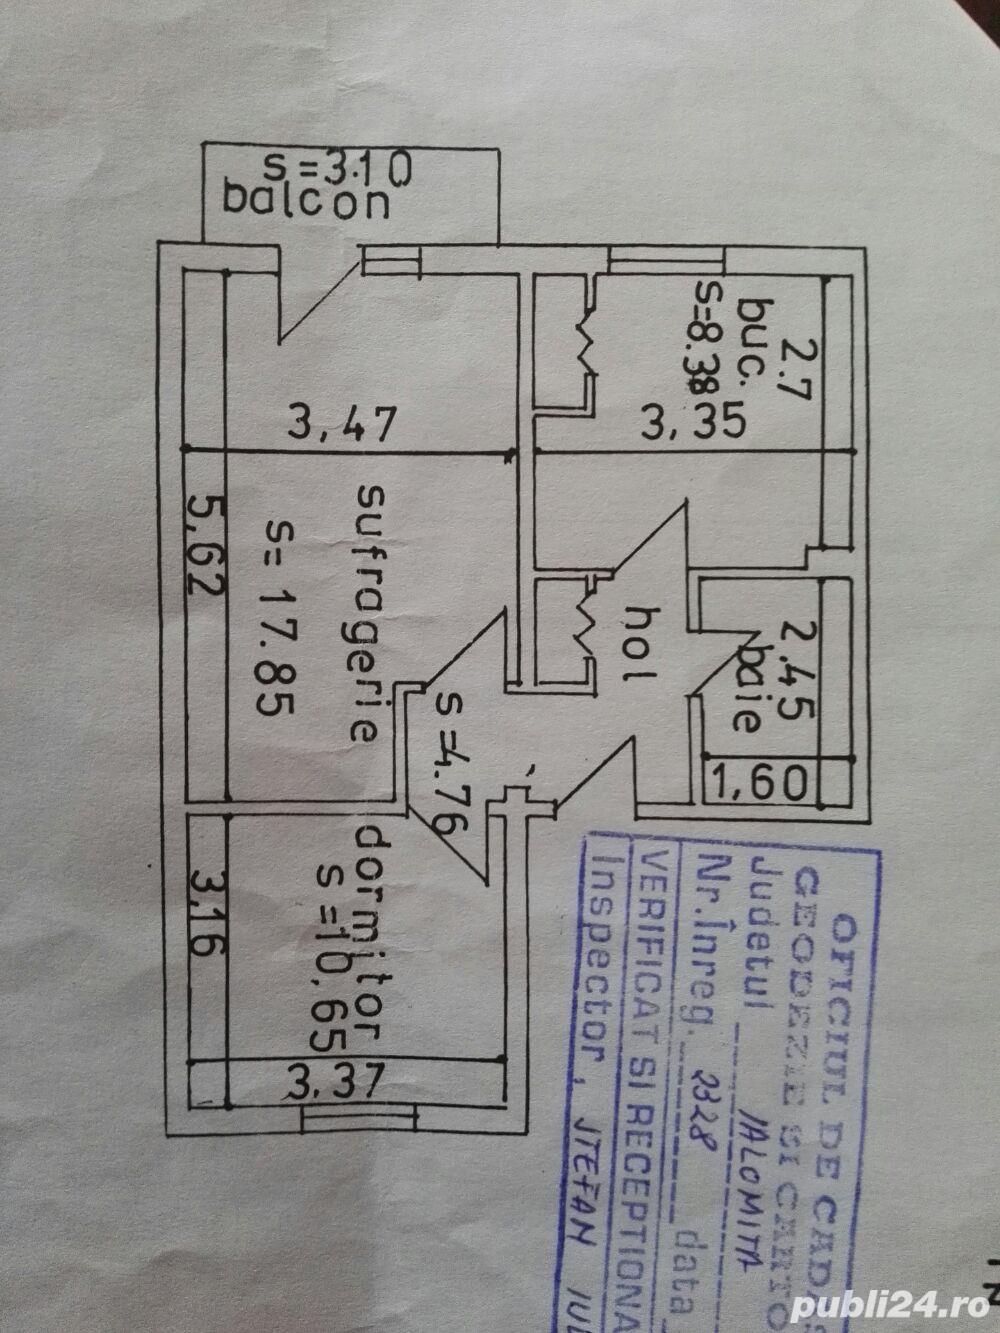 Apartament 2 camere, etaj 3 din 4 confort 1 decomandat, Urziceni, jud. Ialomita